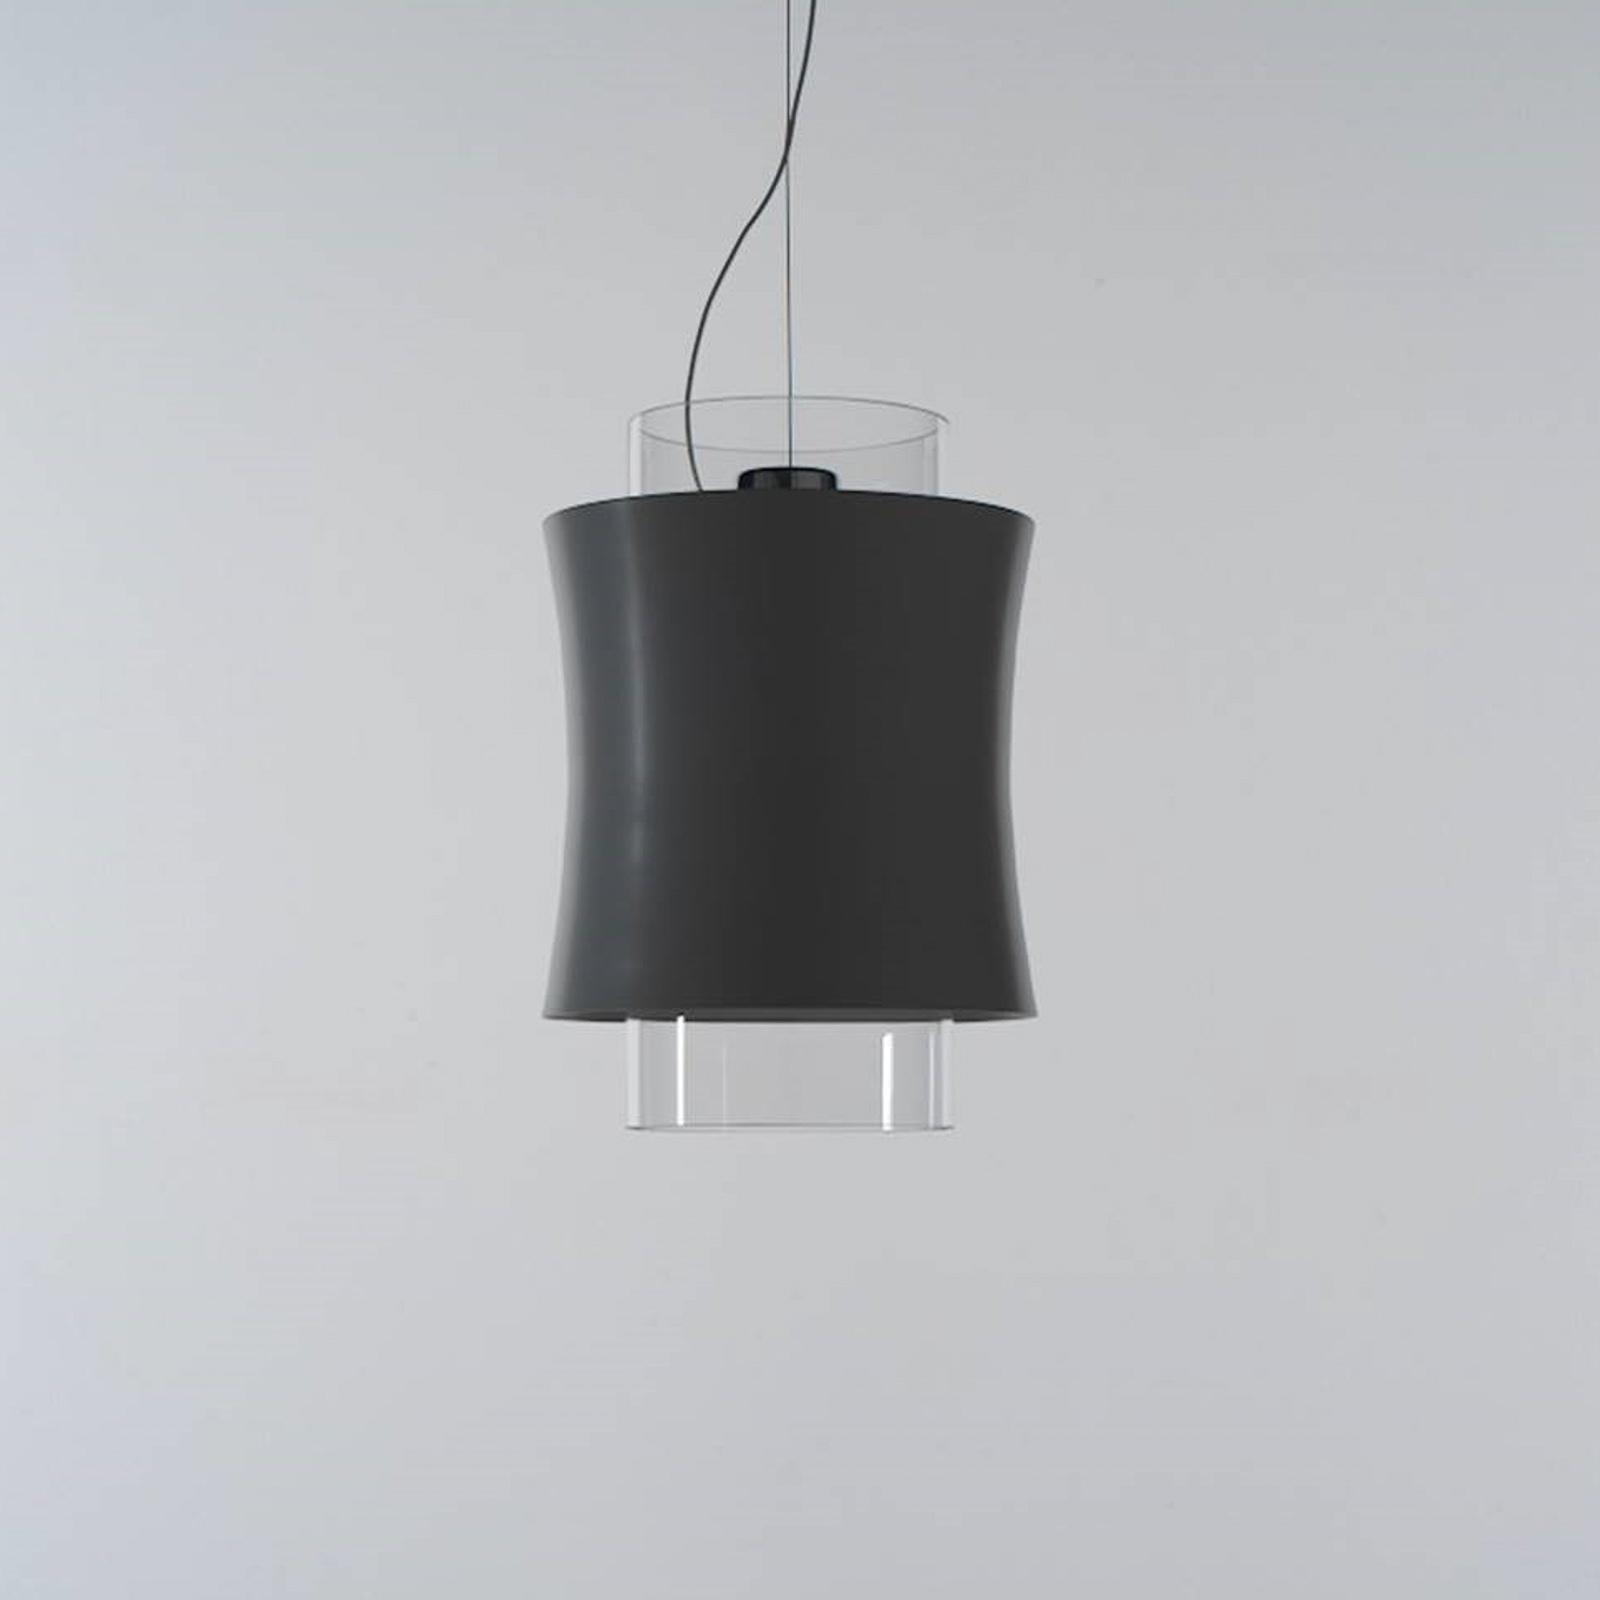 Prandina Fez S1 -riippuvalo, musta